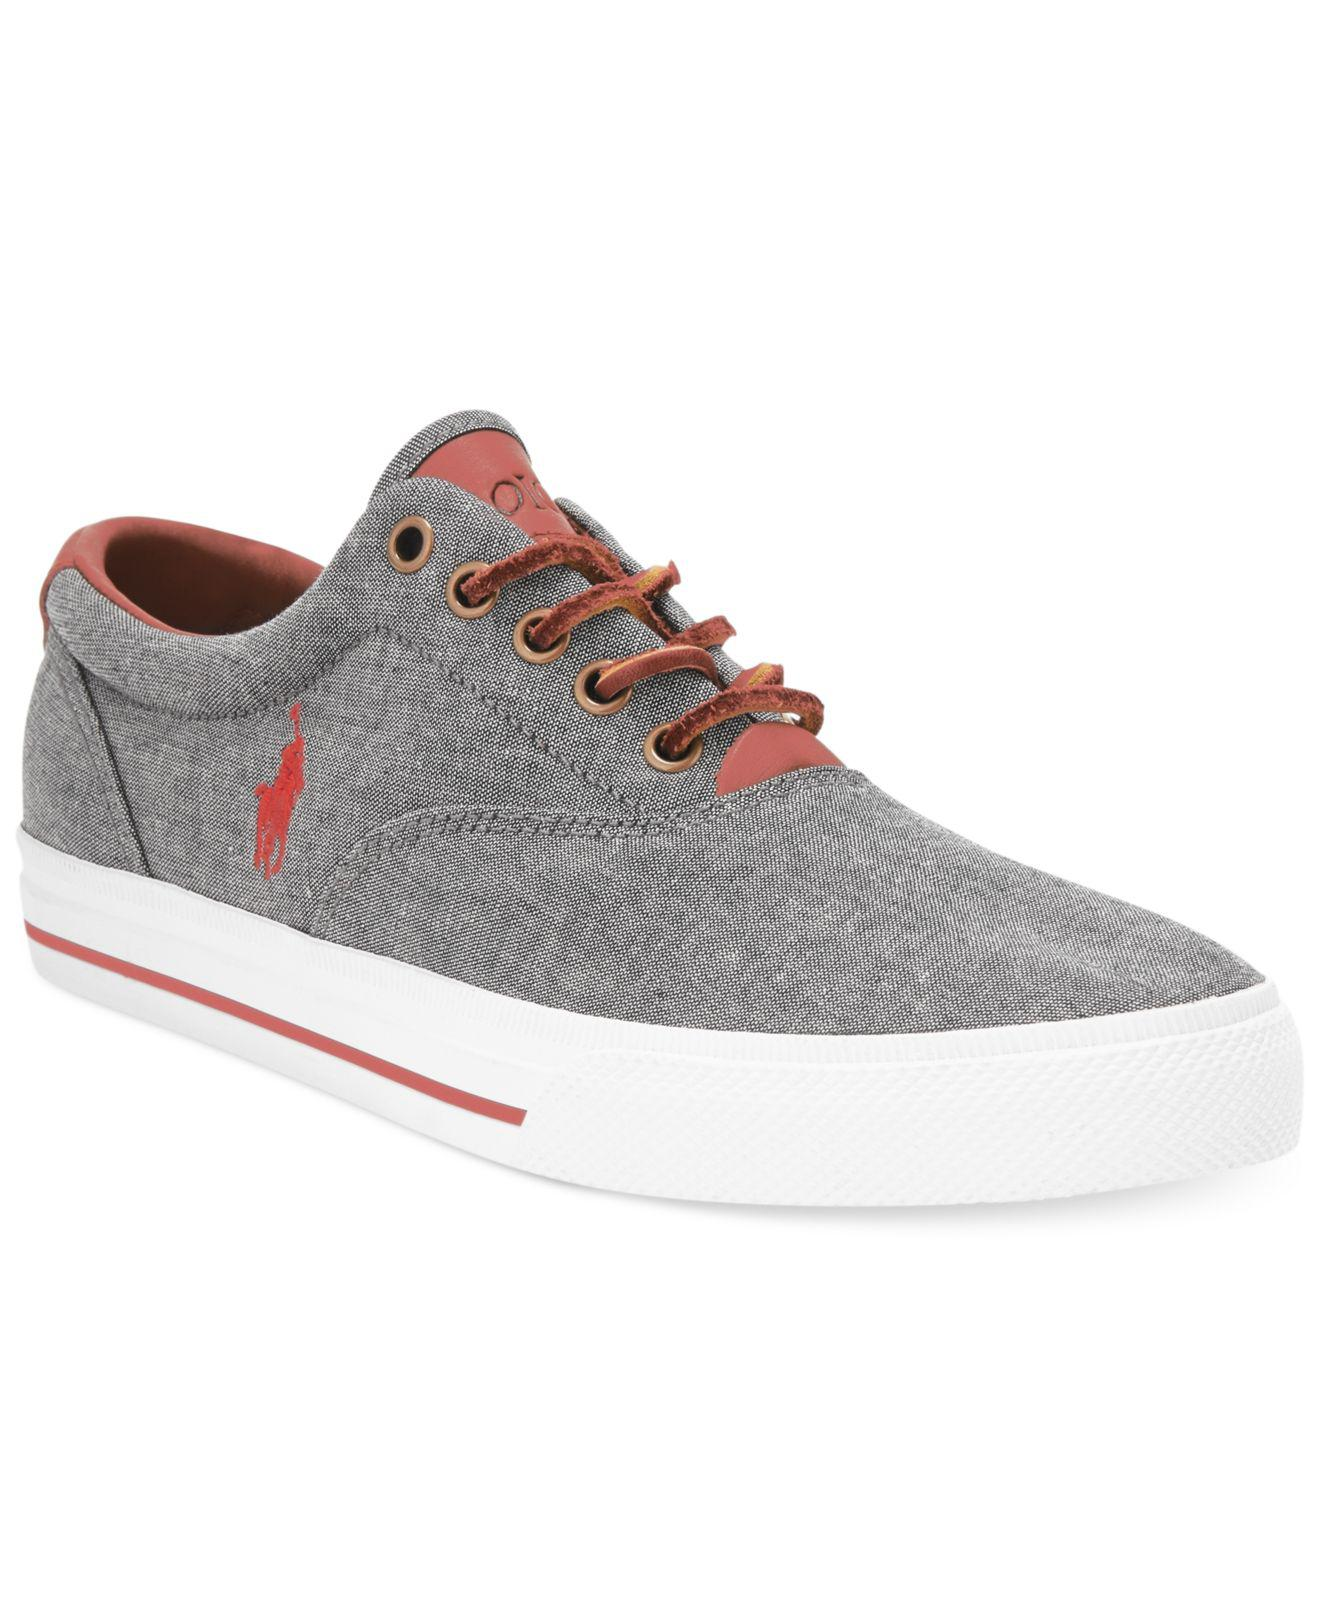 polo ralph lauren shoes vaughn lace sneaker adidas templates pan